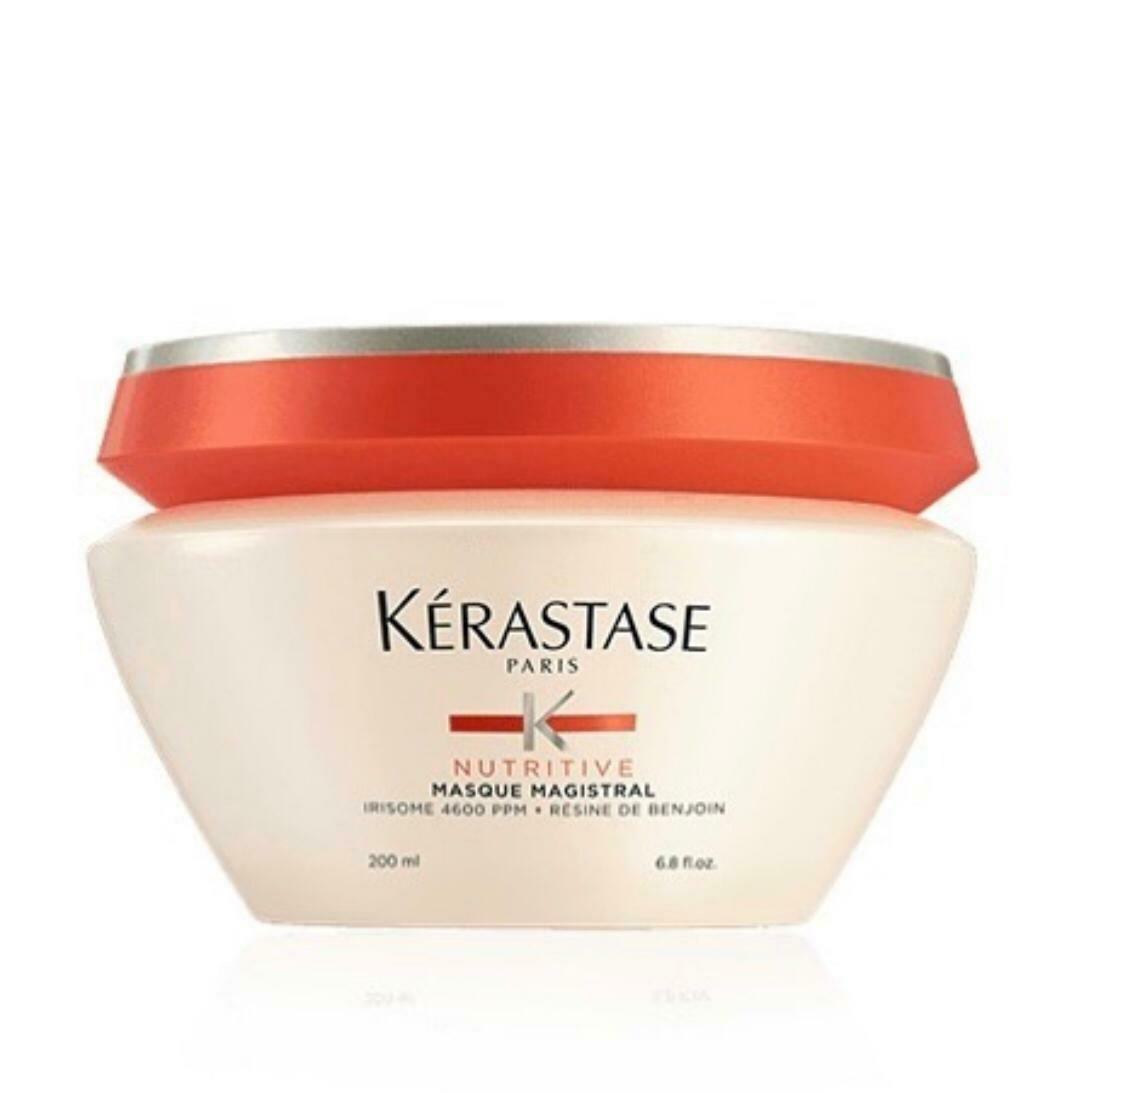 Masque Magistral - Kérastase